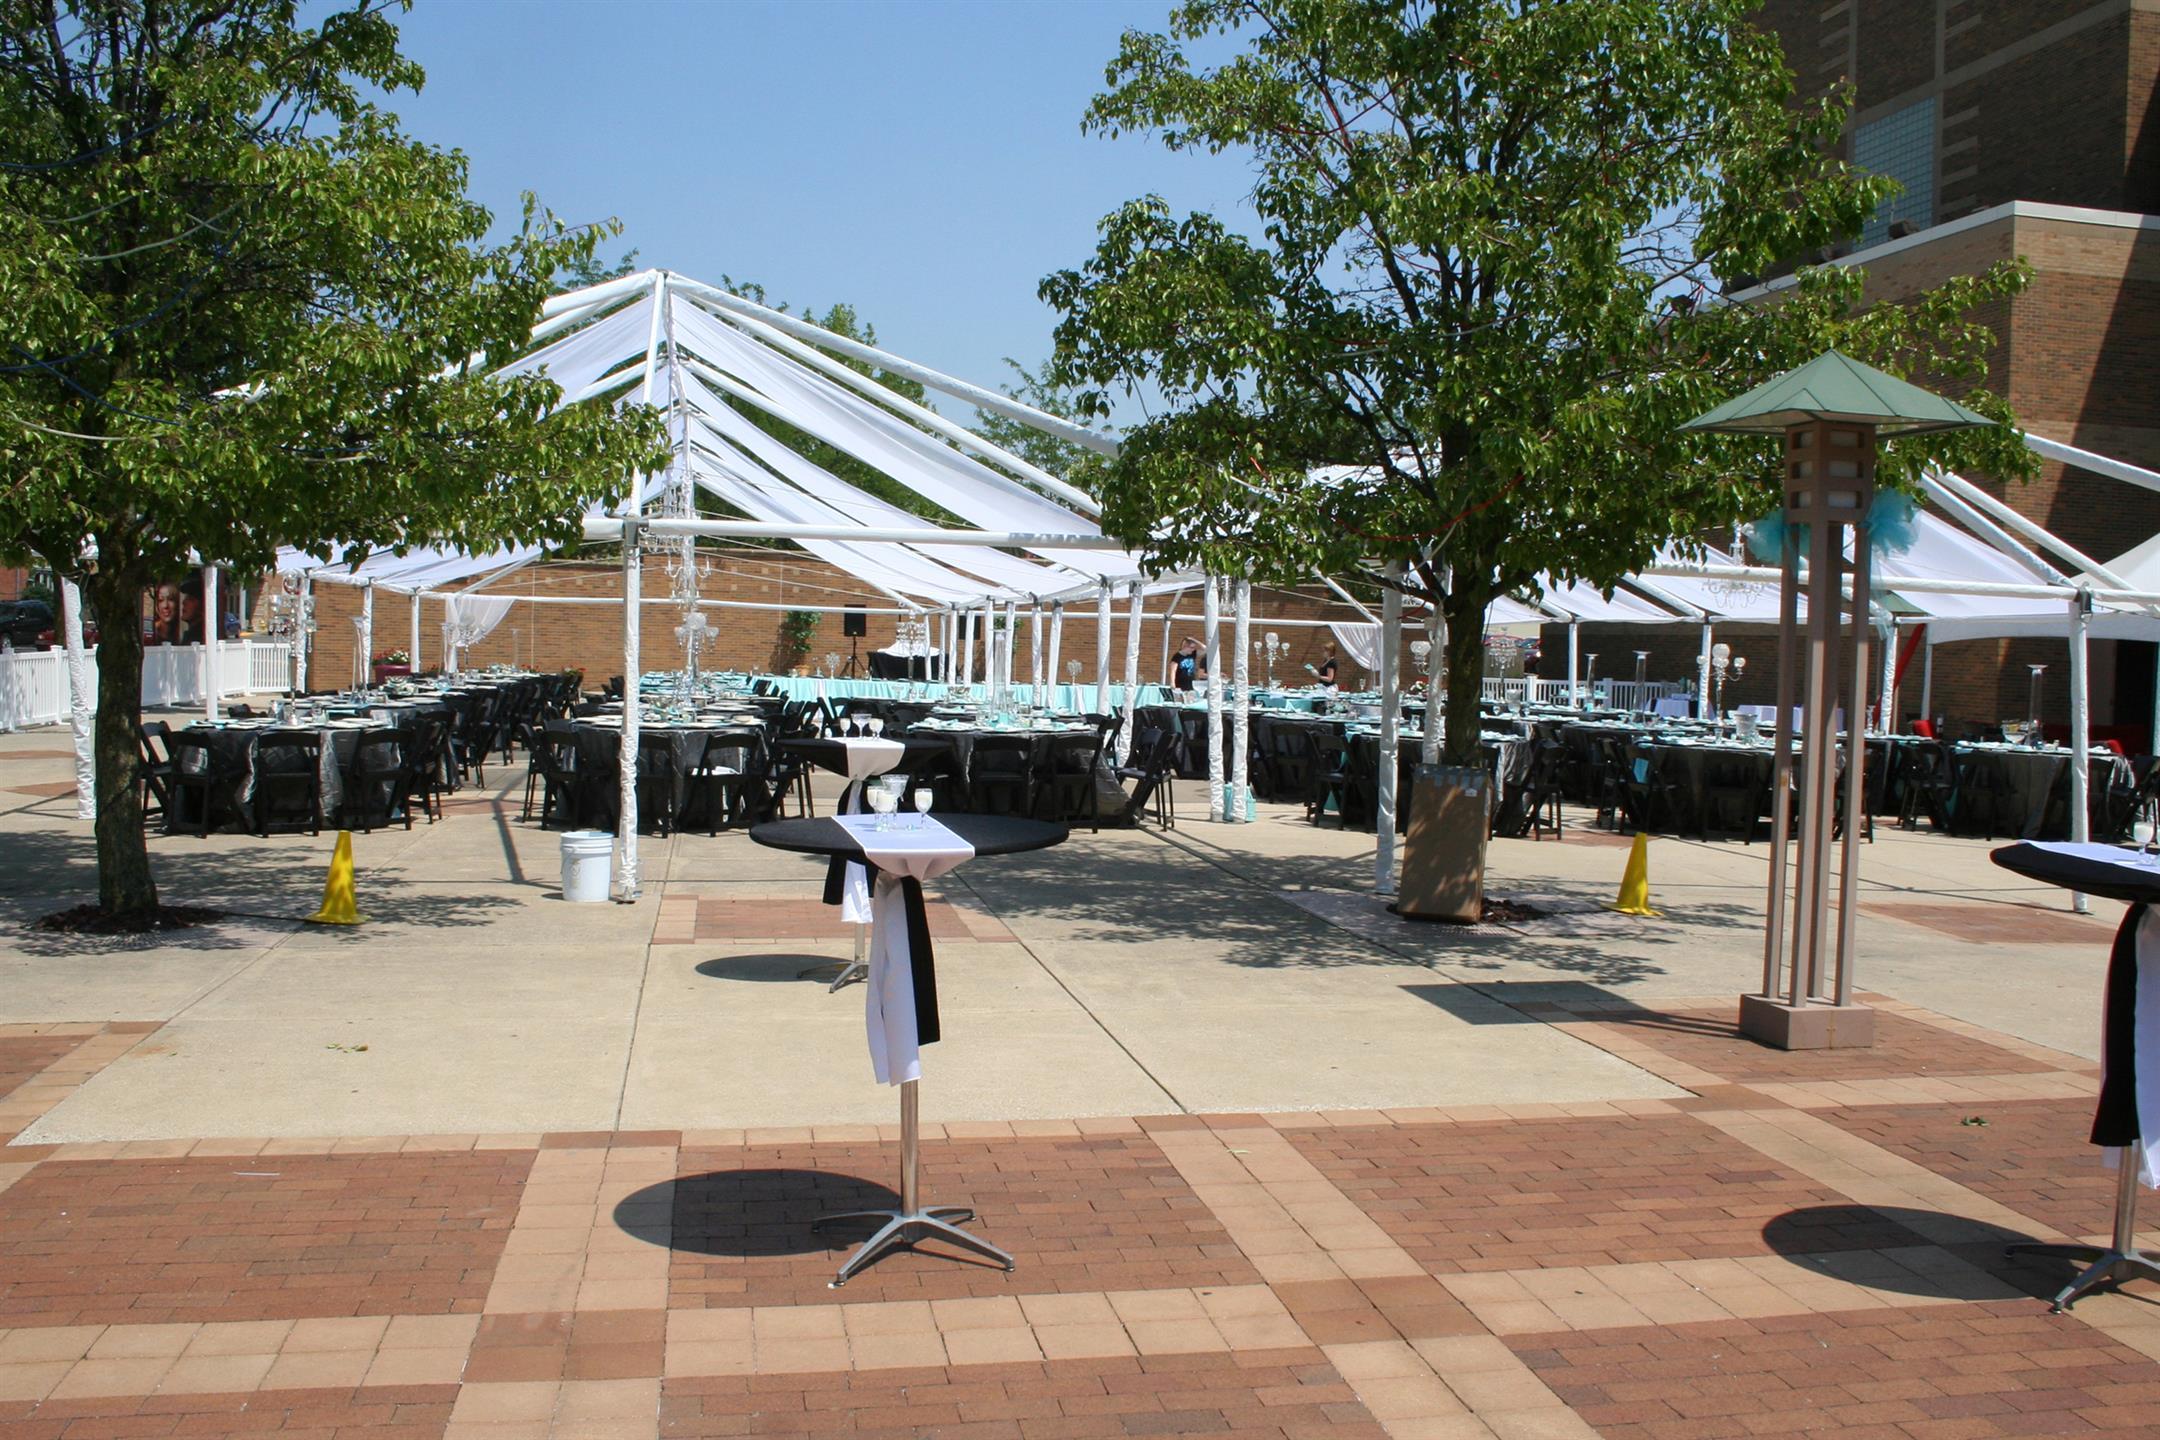 Honeywell Center - Carpenter Plaza